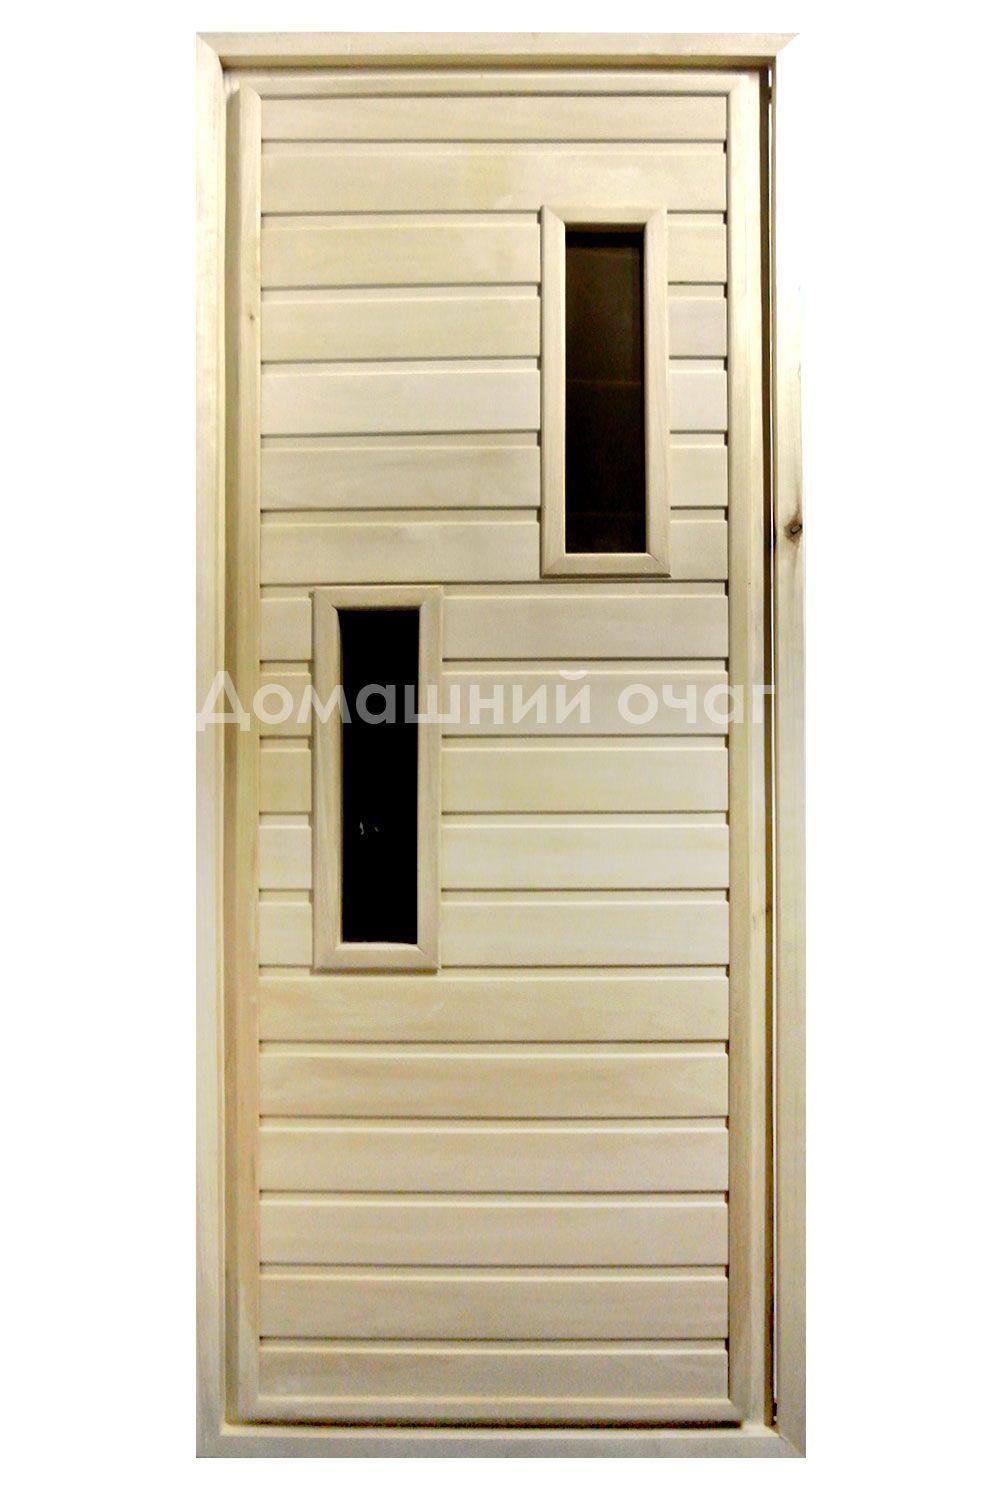 dveri1